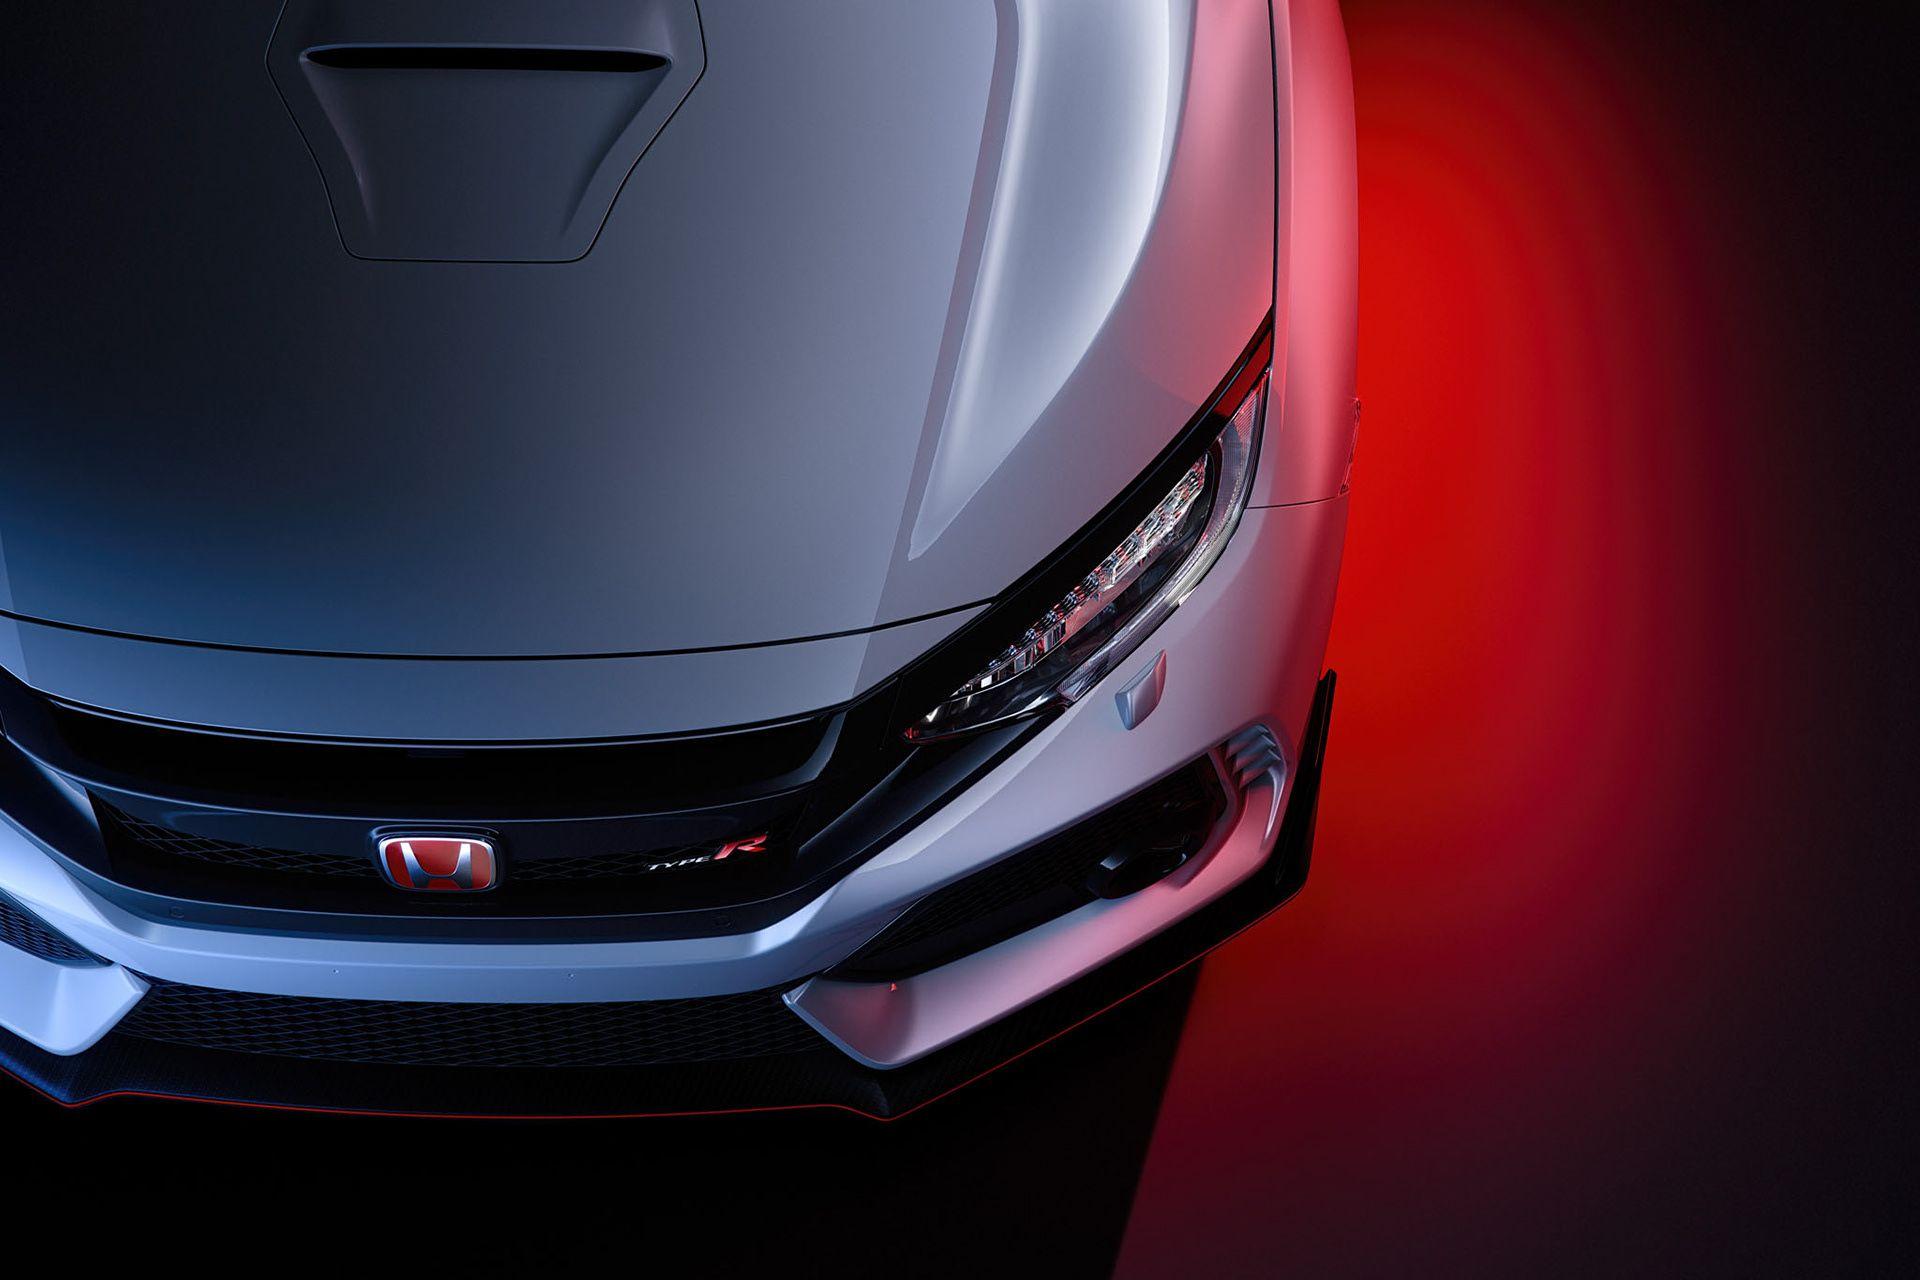 Pin By B On Automotive Inspiration Honda Civic Type R Honda Civic Honda